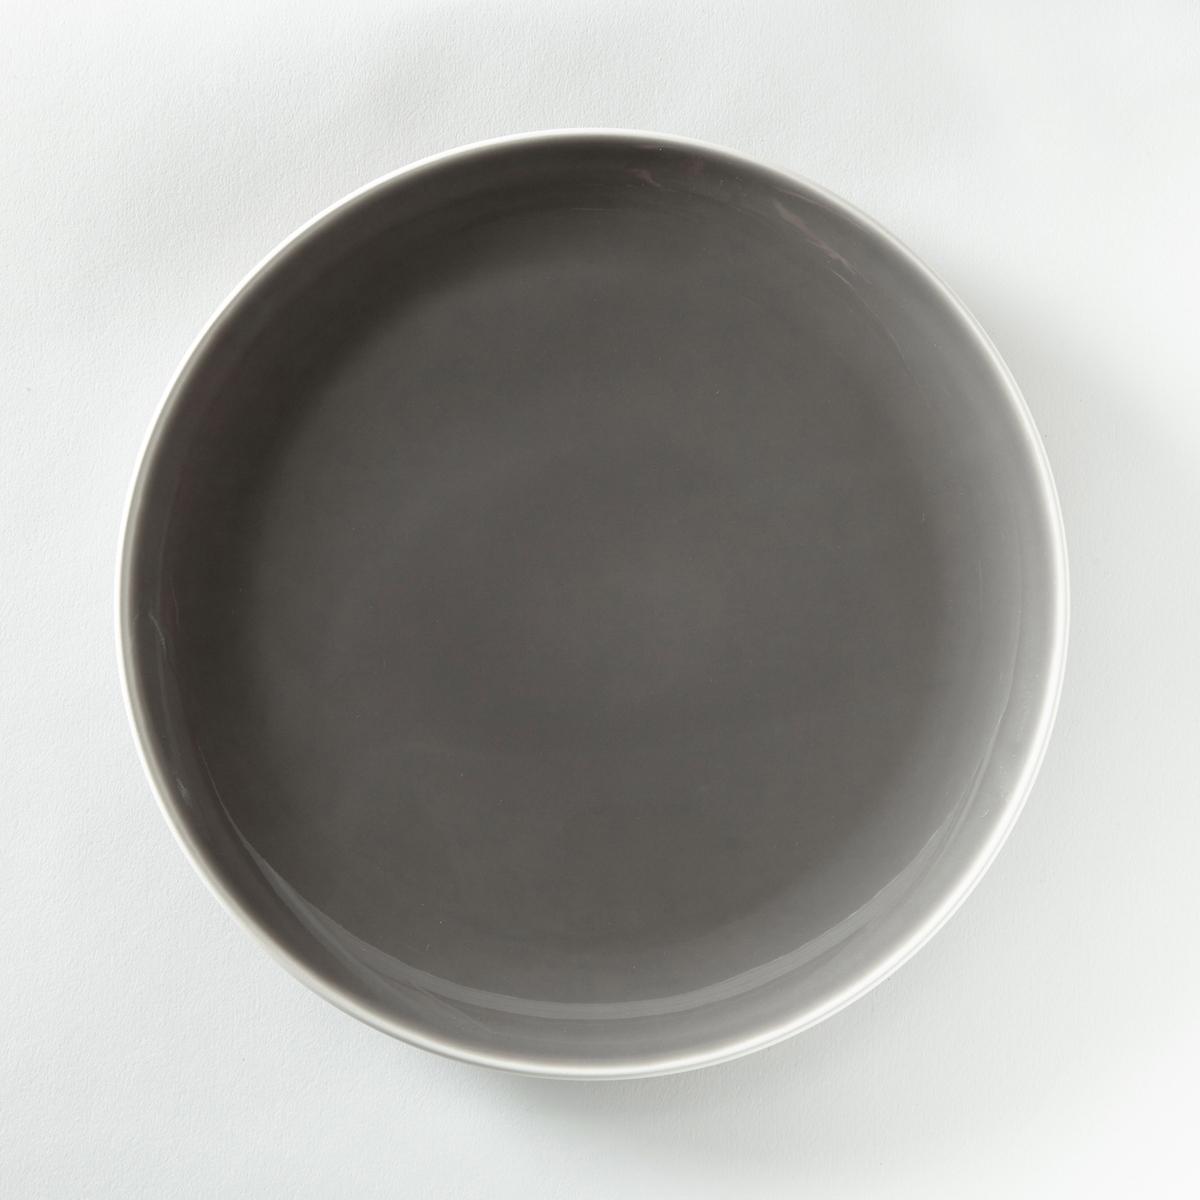 4 тарелки плоские с дизайнерским рисунком от La Redoute